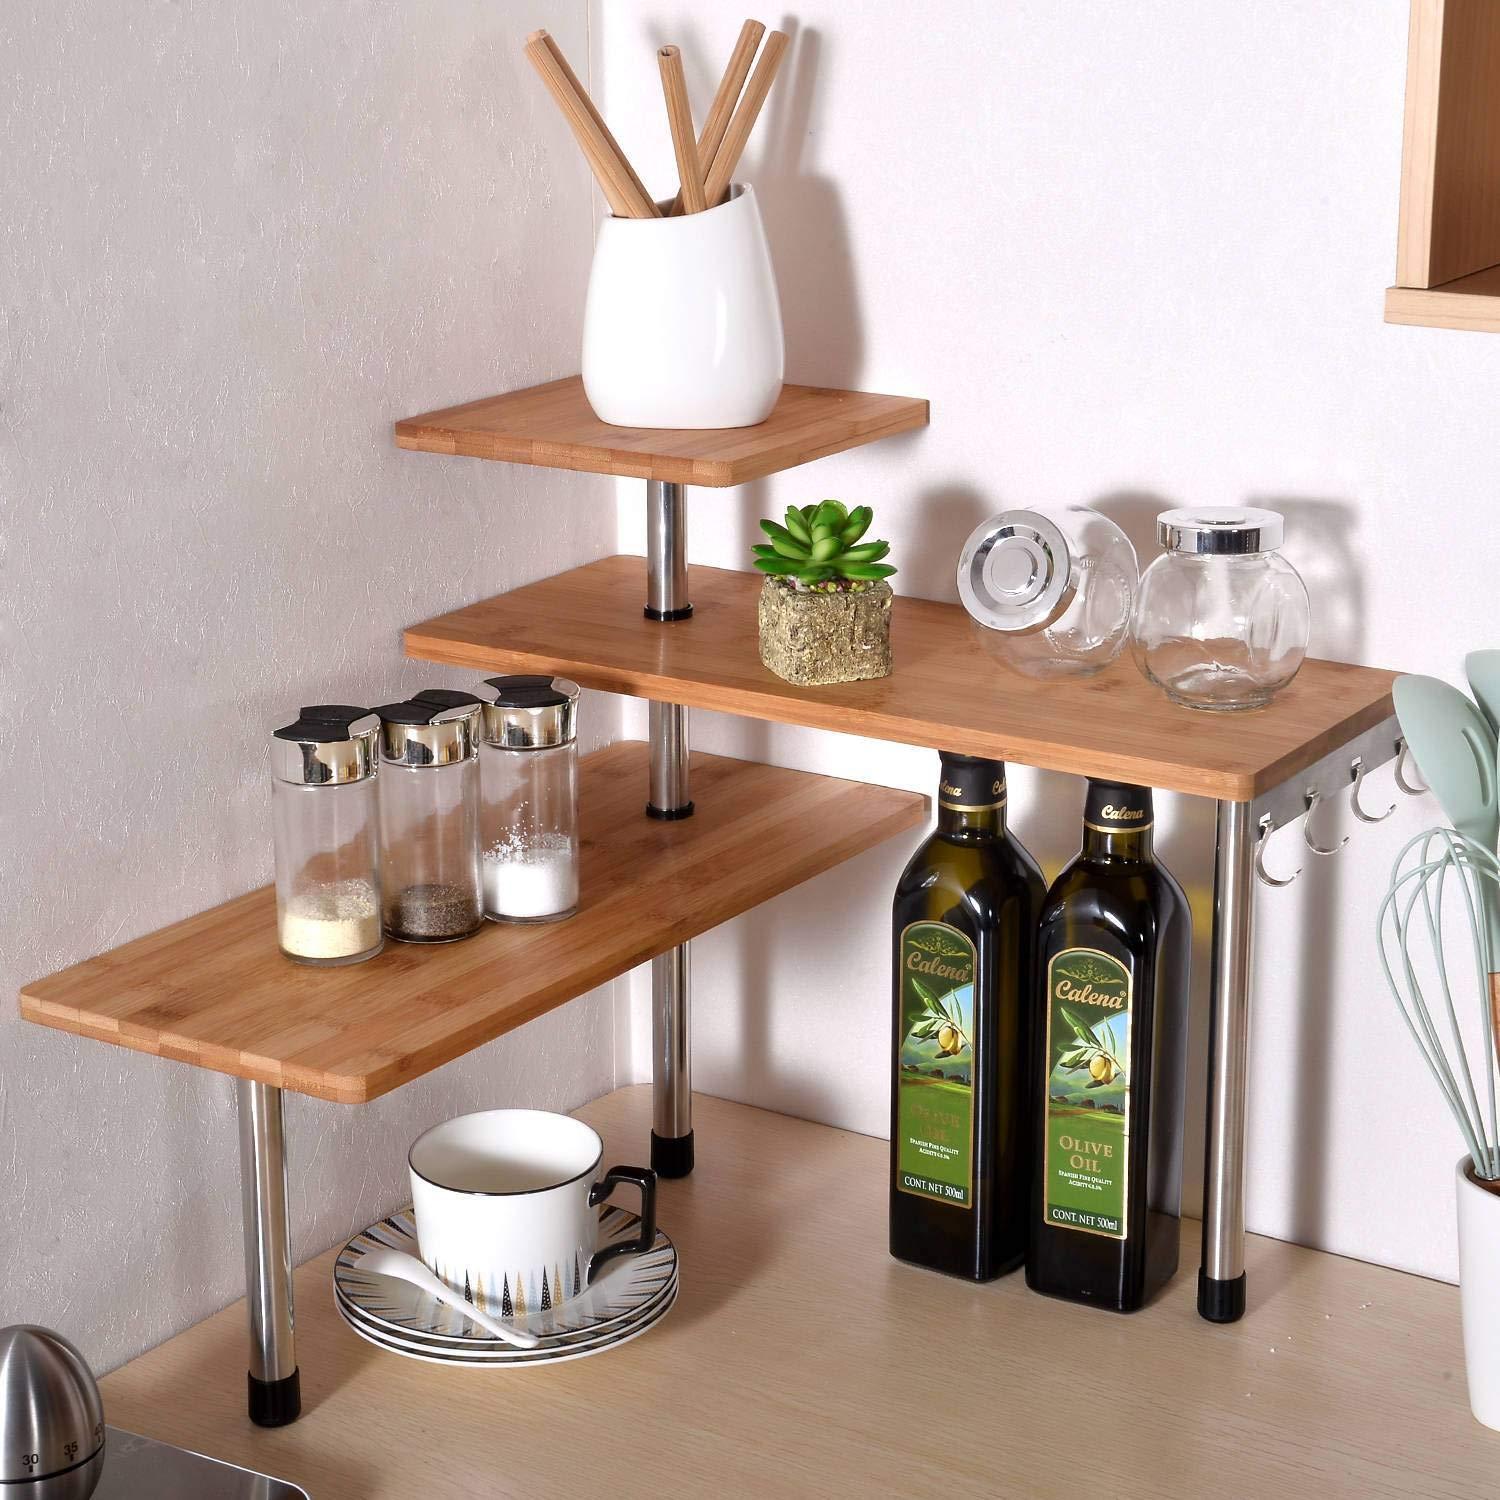 Ollieroo 3 Tier Corner Shelf Bamboo Spice Rack Desk Bookshelf Display  Shelves Space Saving Organizer for Living Room, Kitchen, Office (with hooks)